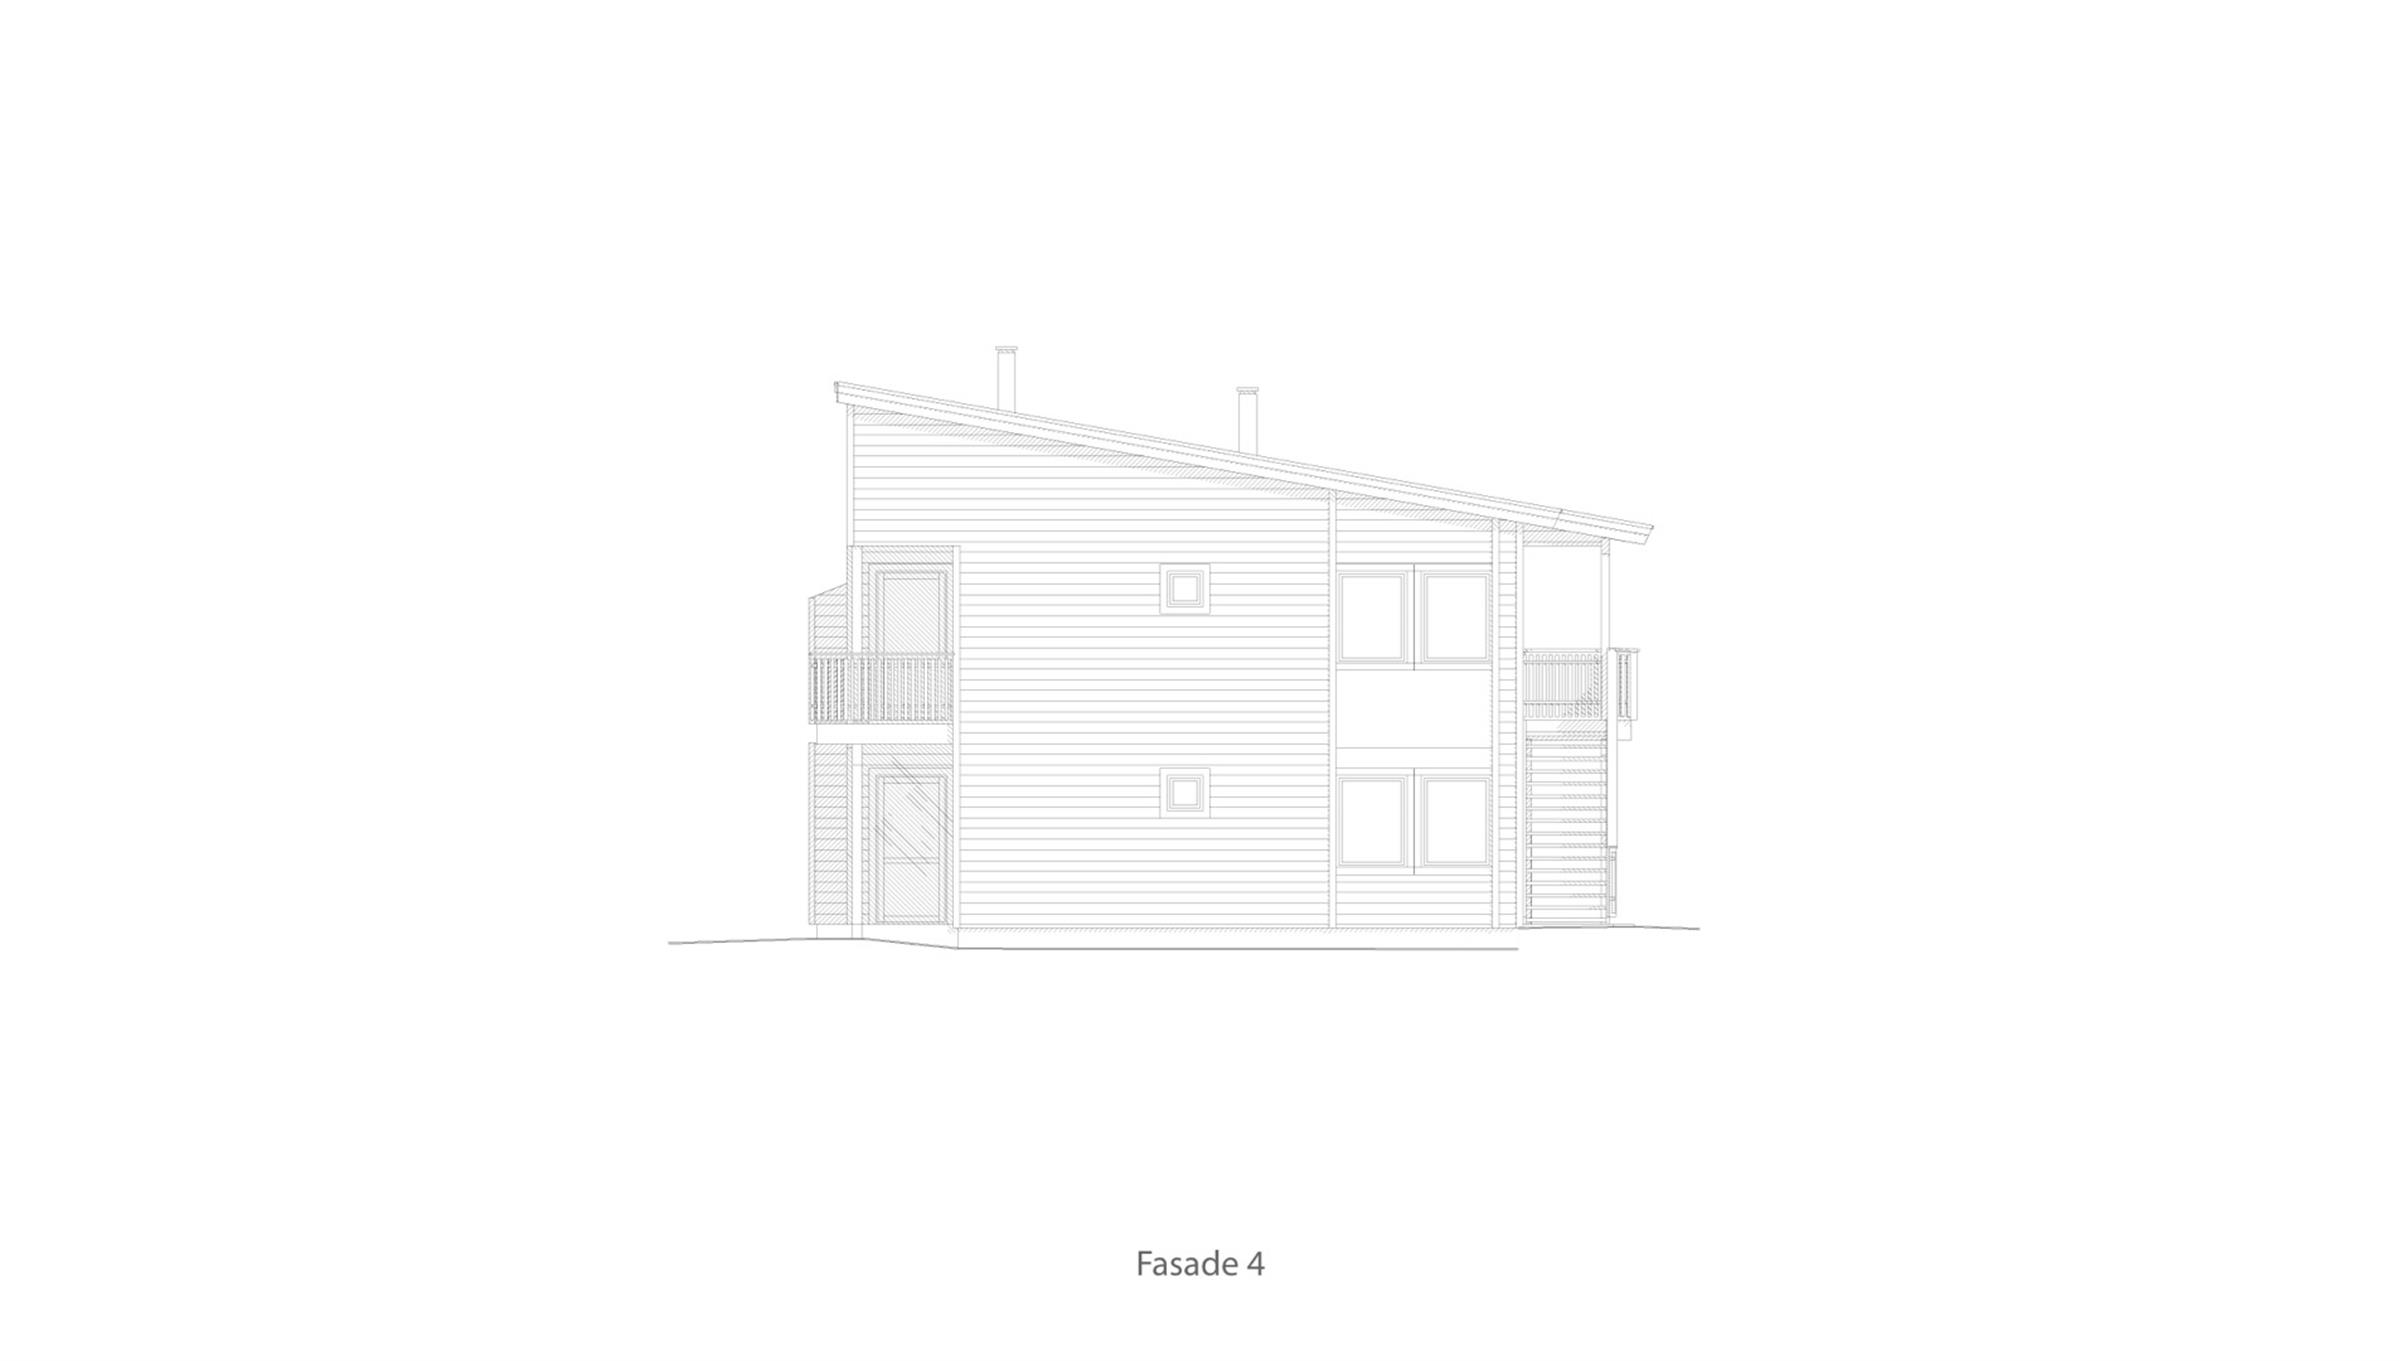 Egersund fasade 4